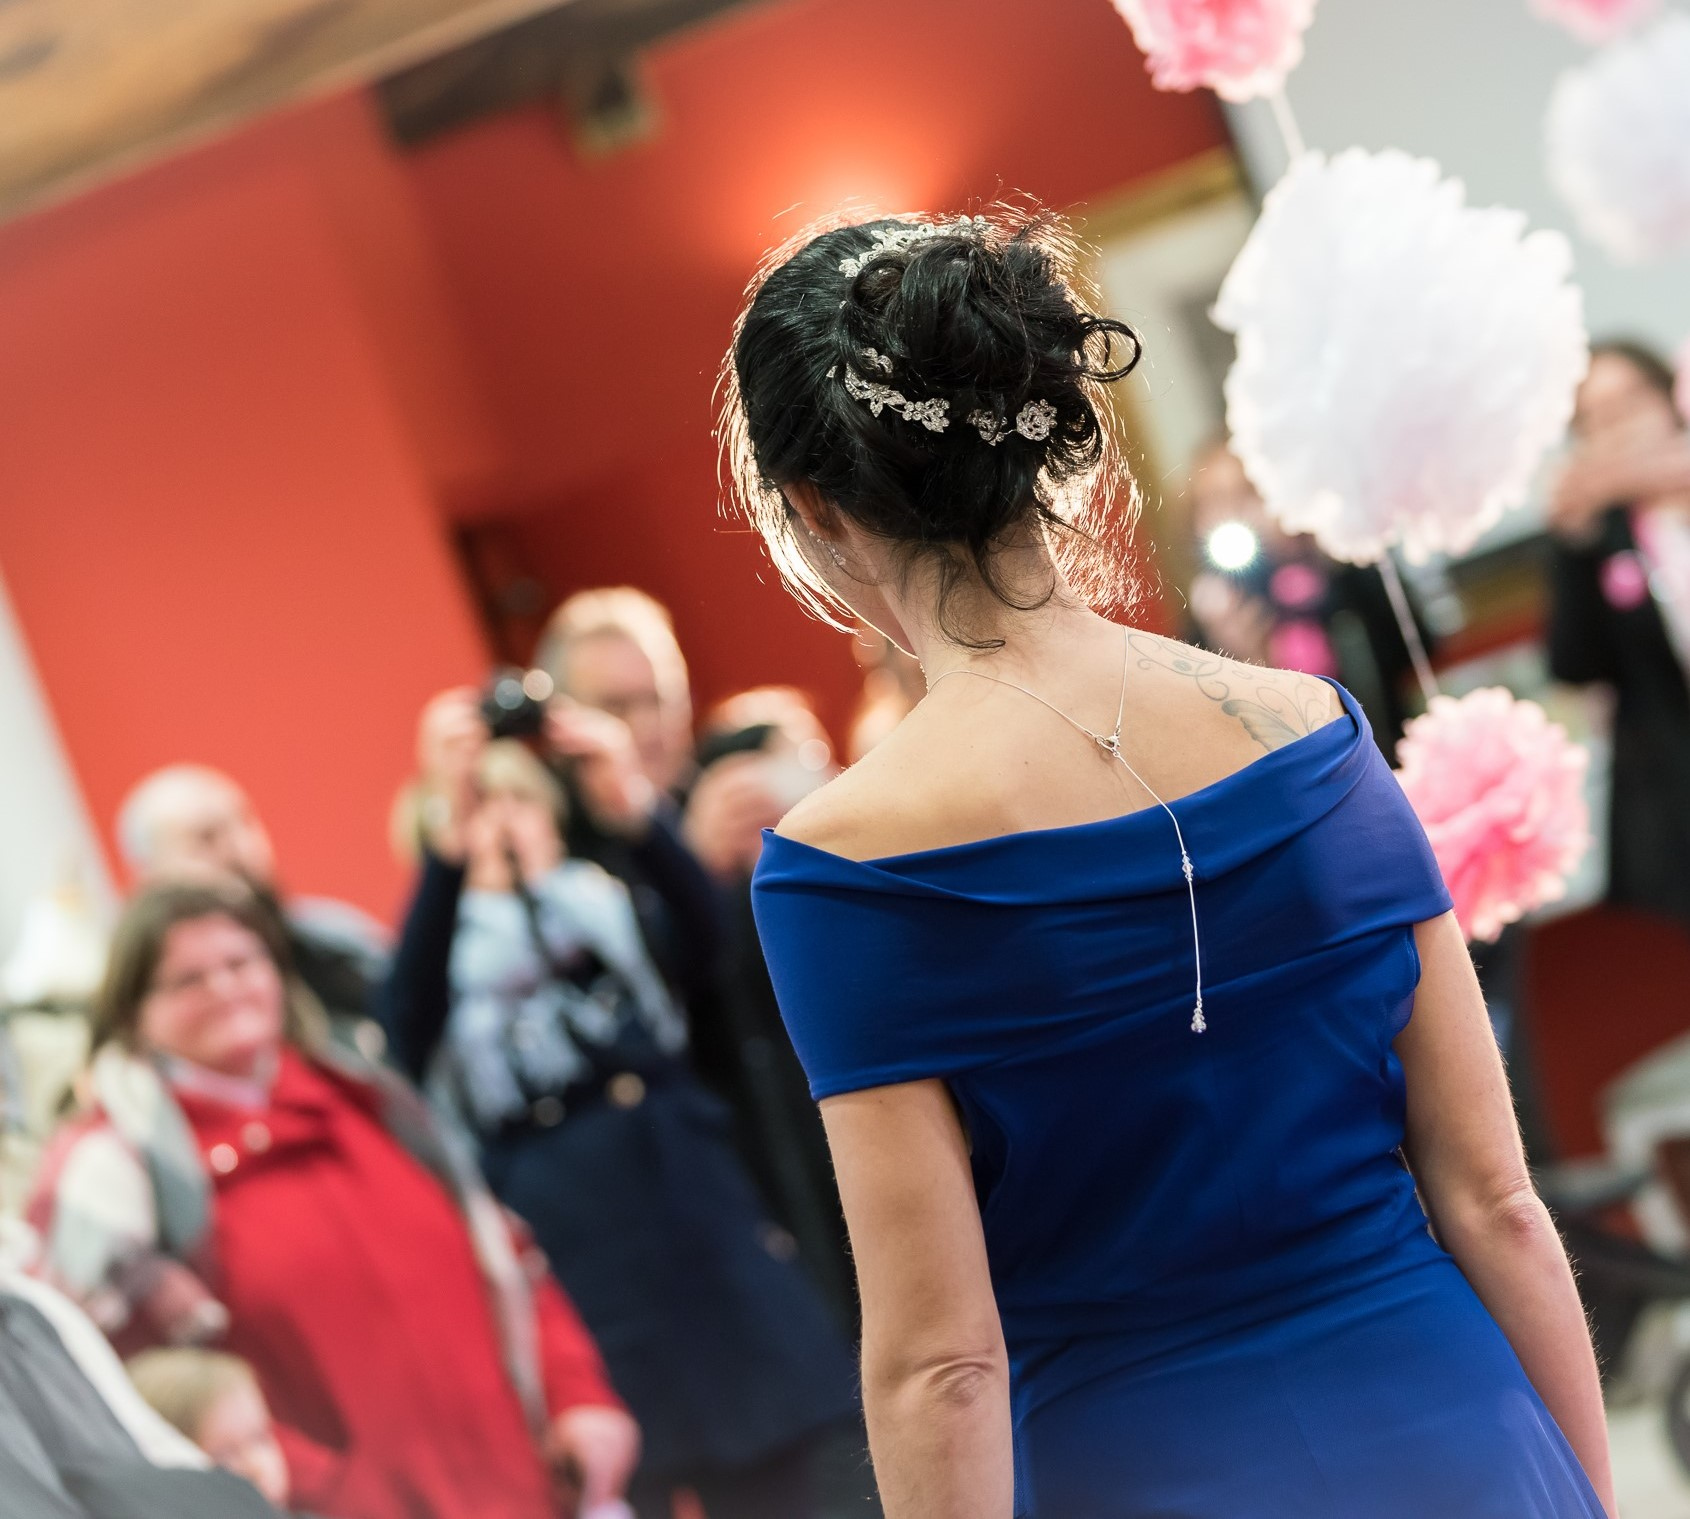 organisation-lieu-salon-mariage-formation-handicap-lacroiseedespossibles-oise